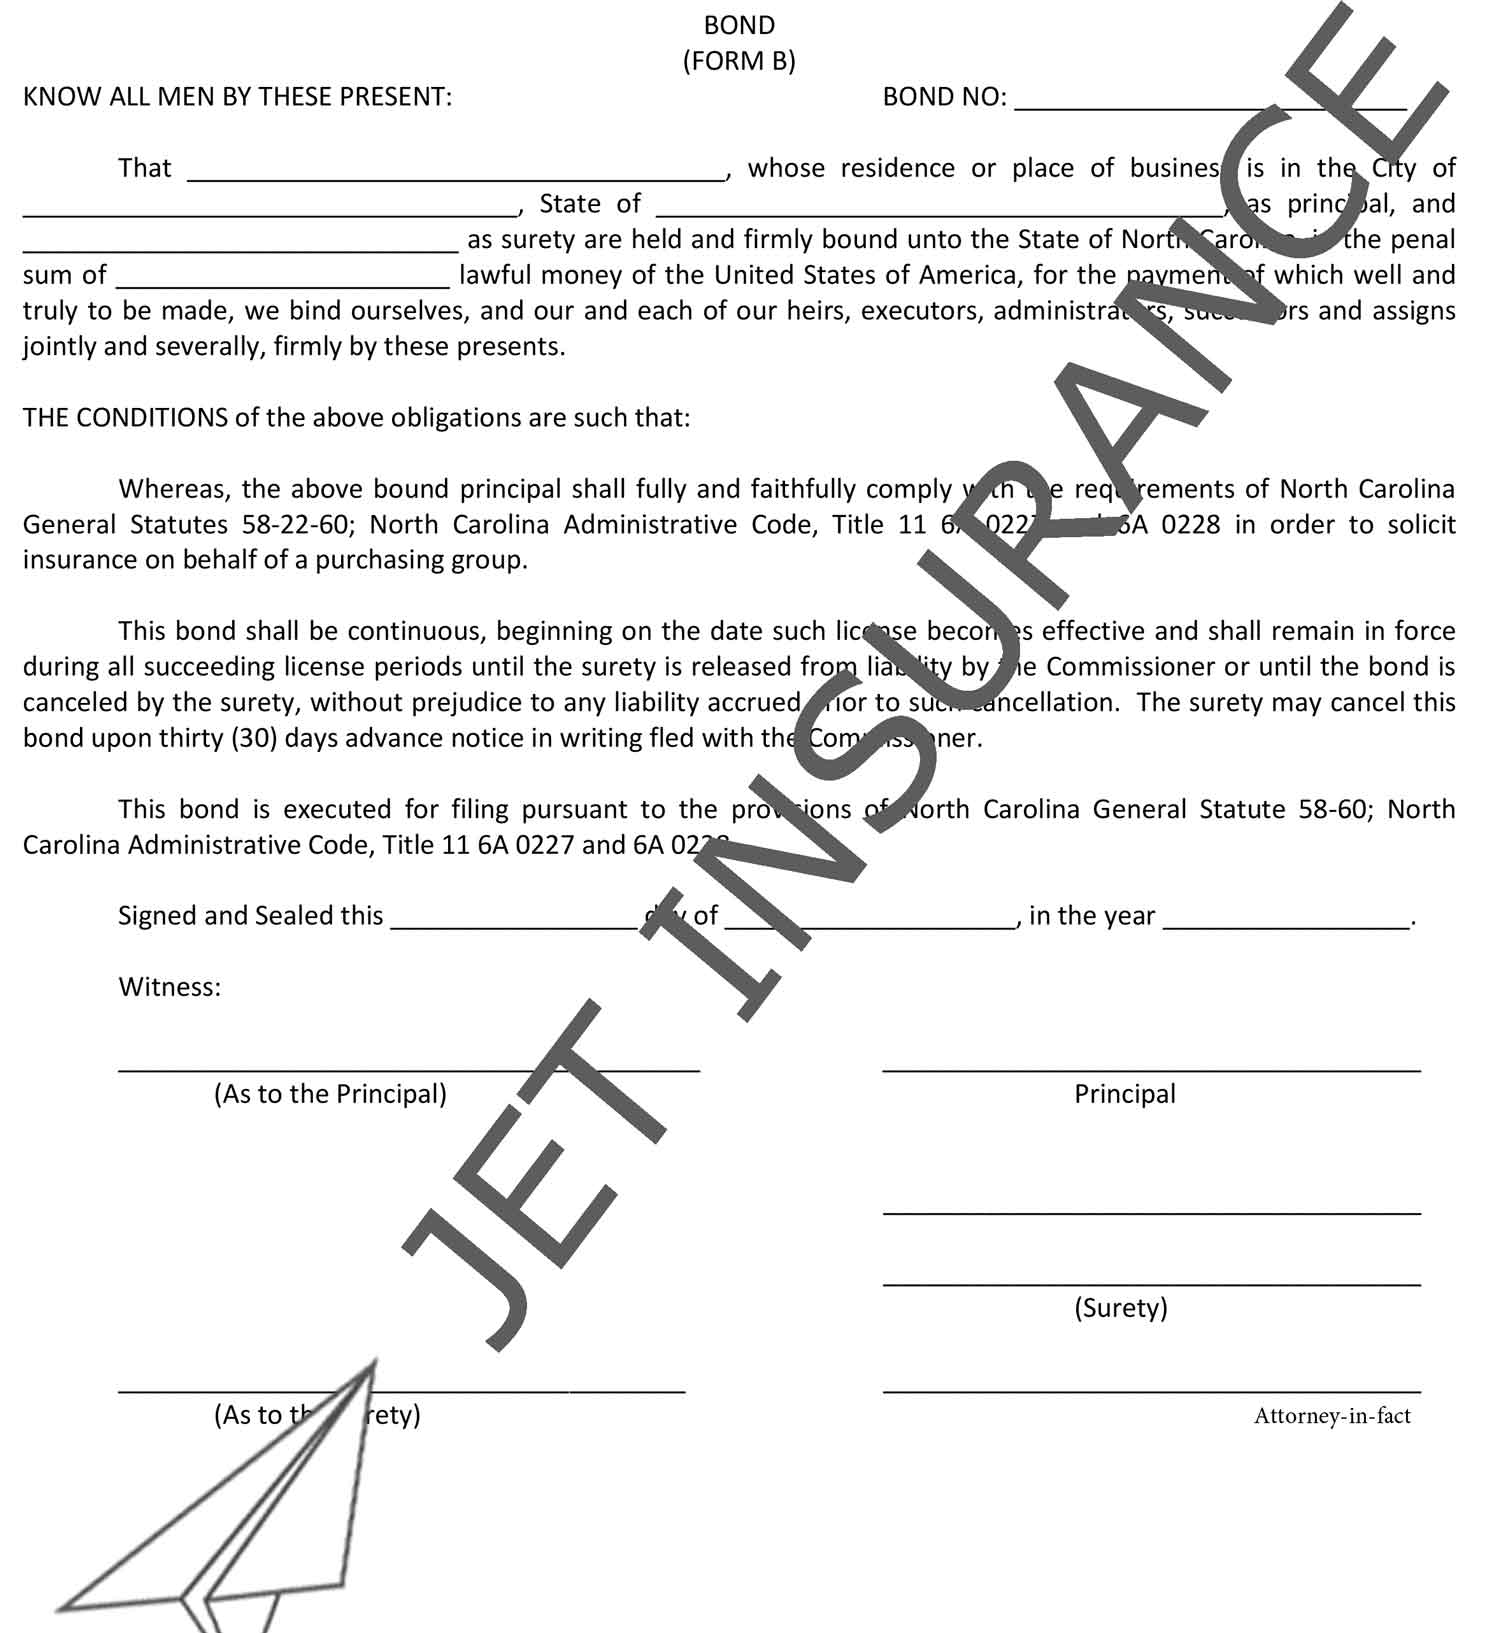 North Carolina Surplus Lines Agent Bond Form